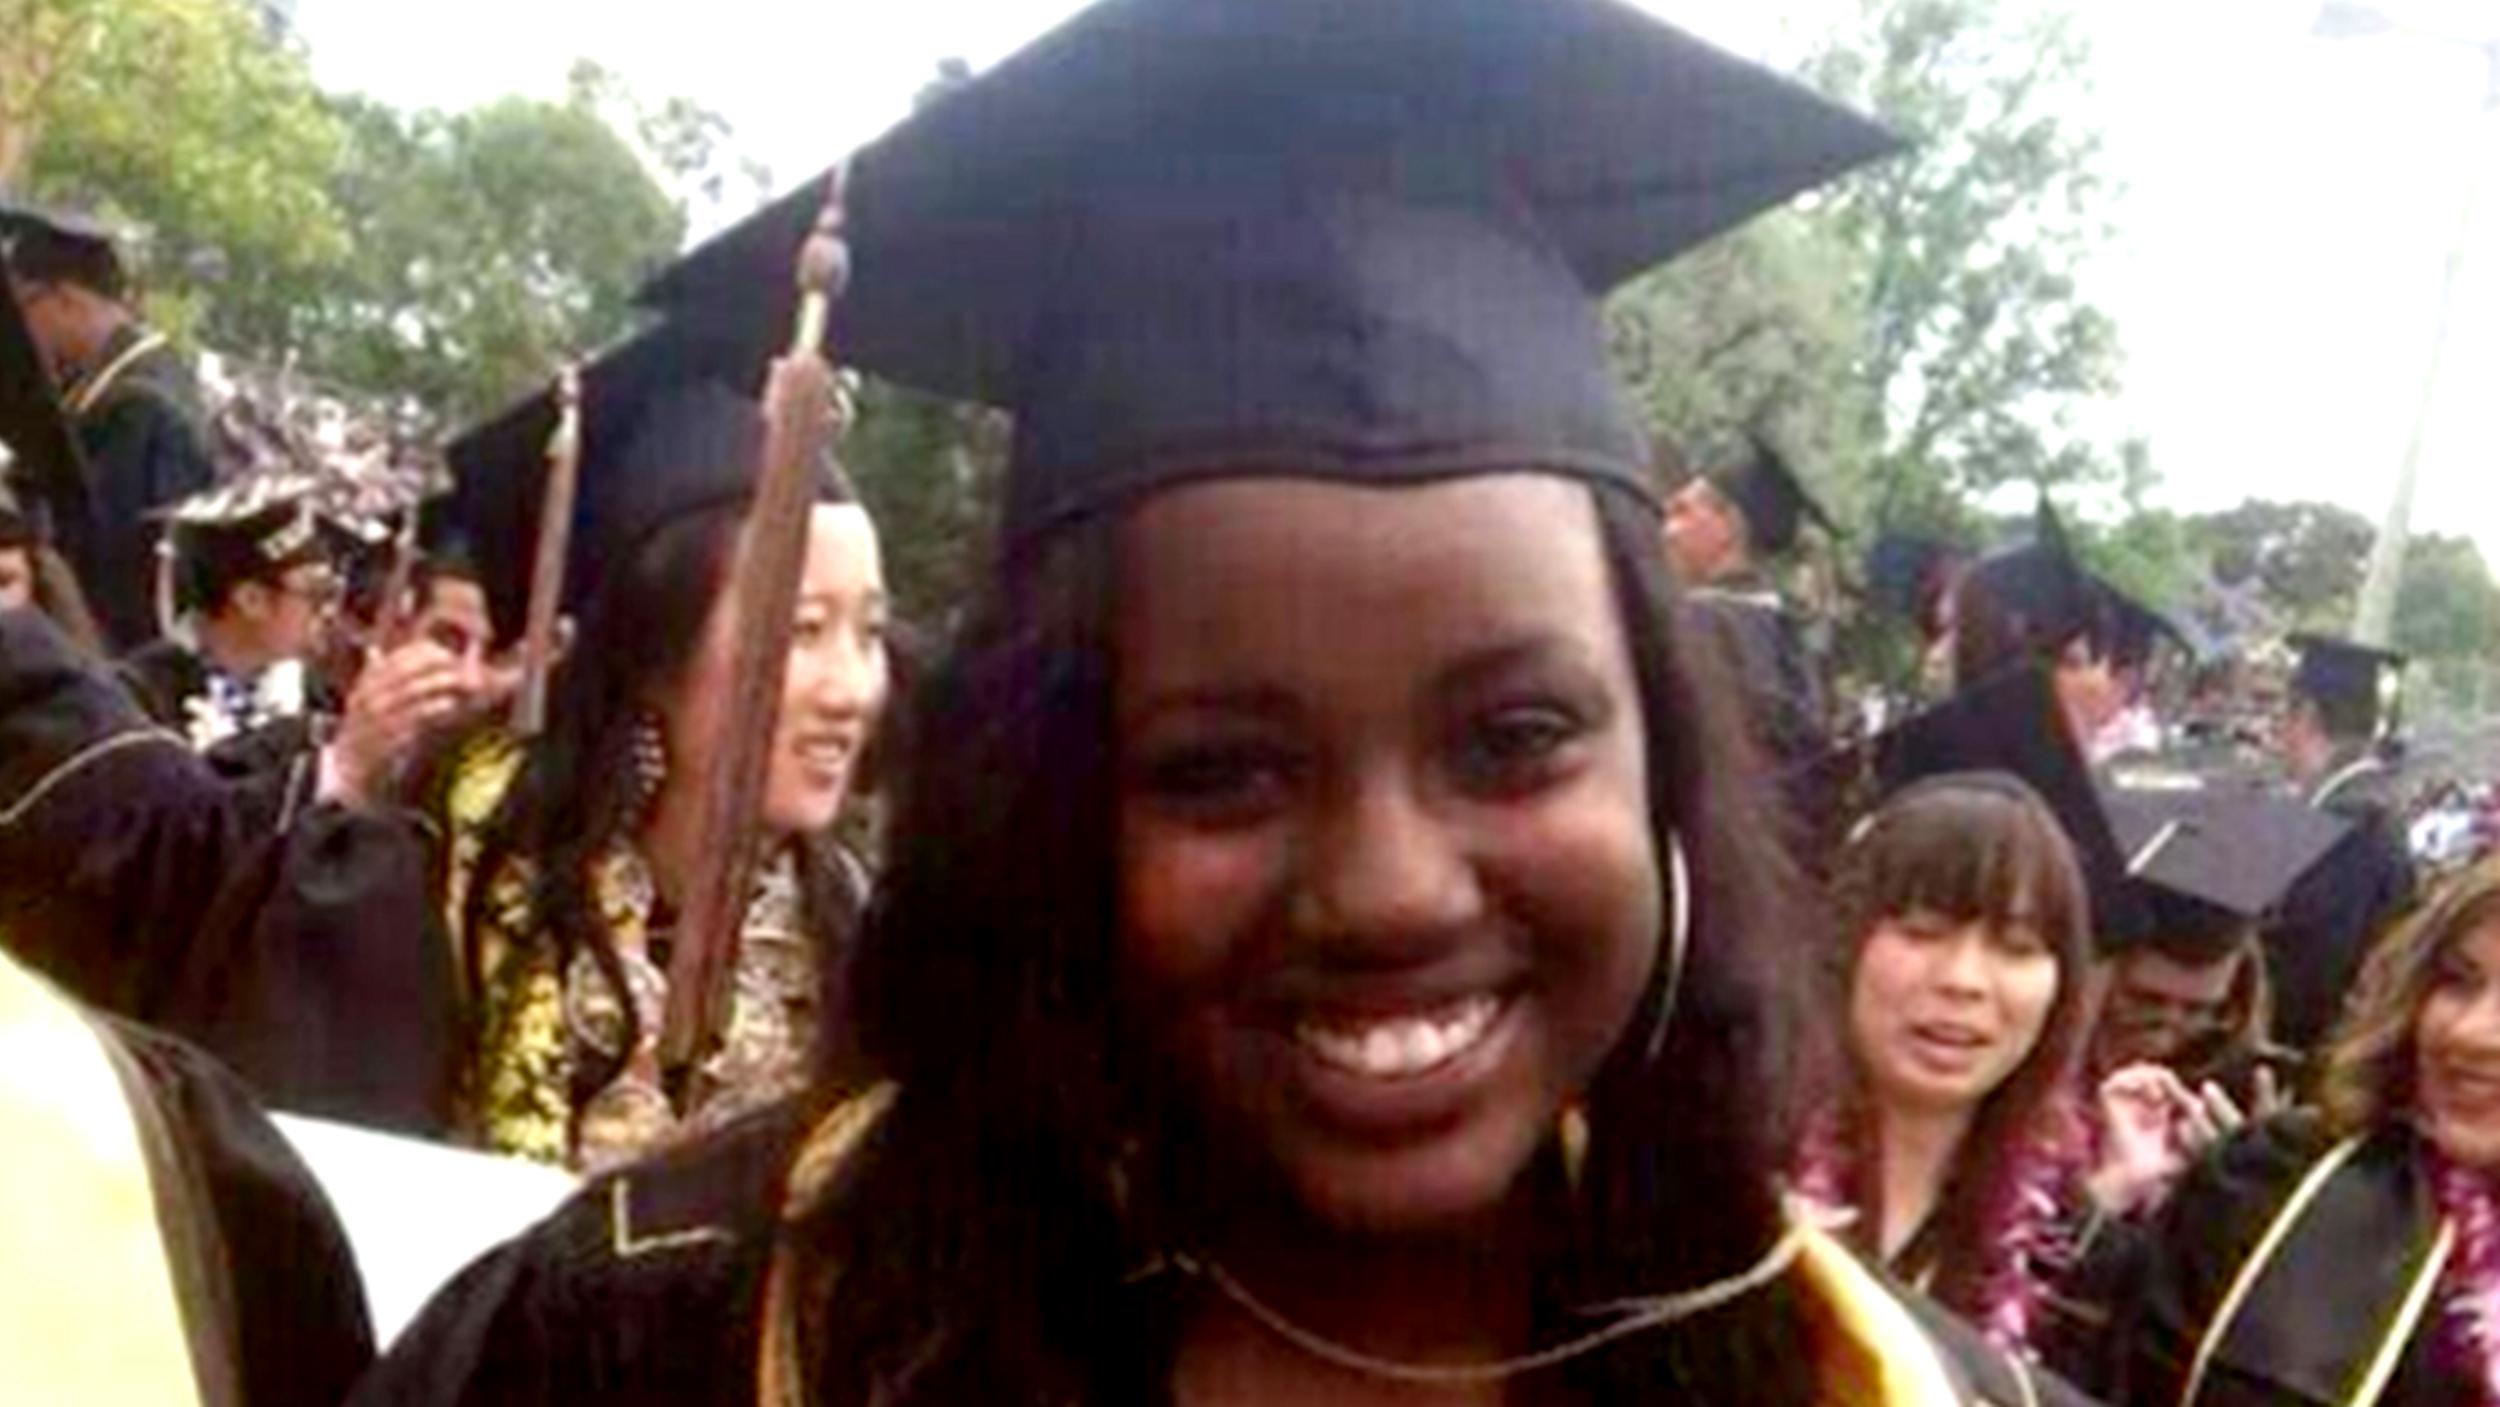 Breast-feeding mom\'s college graduation photo stirs controversy